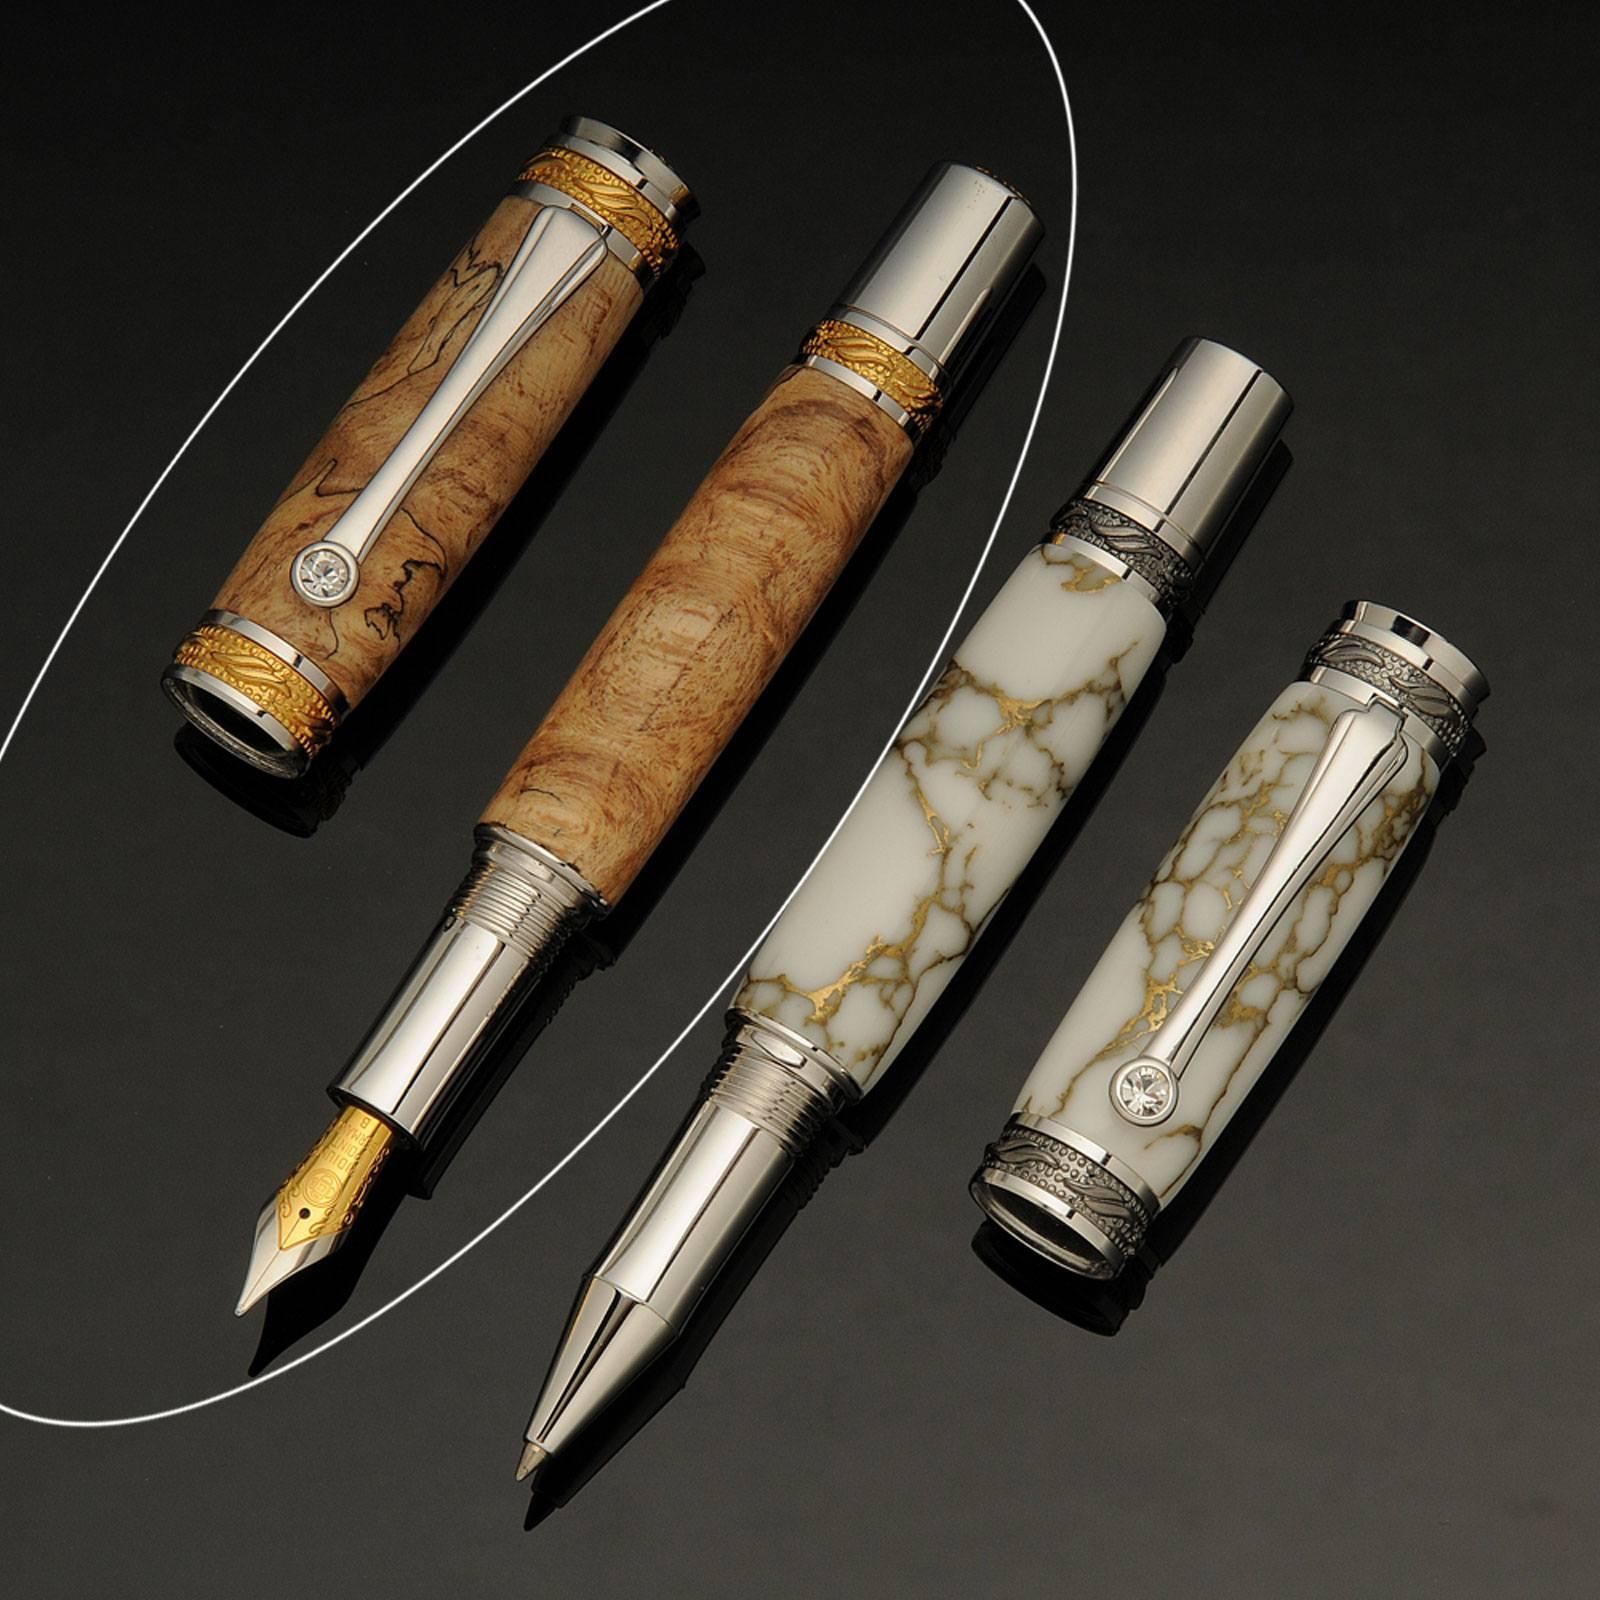 Tycoon Fountain Pen in Rhodium Made from Bubinga